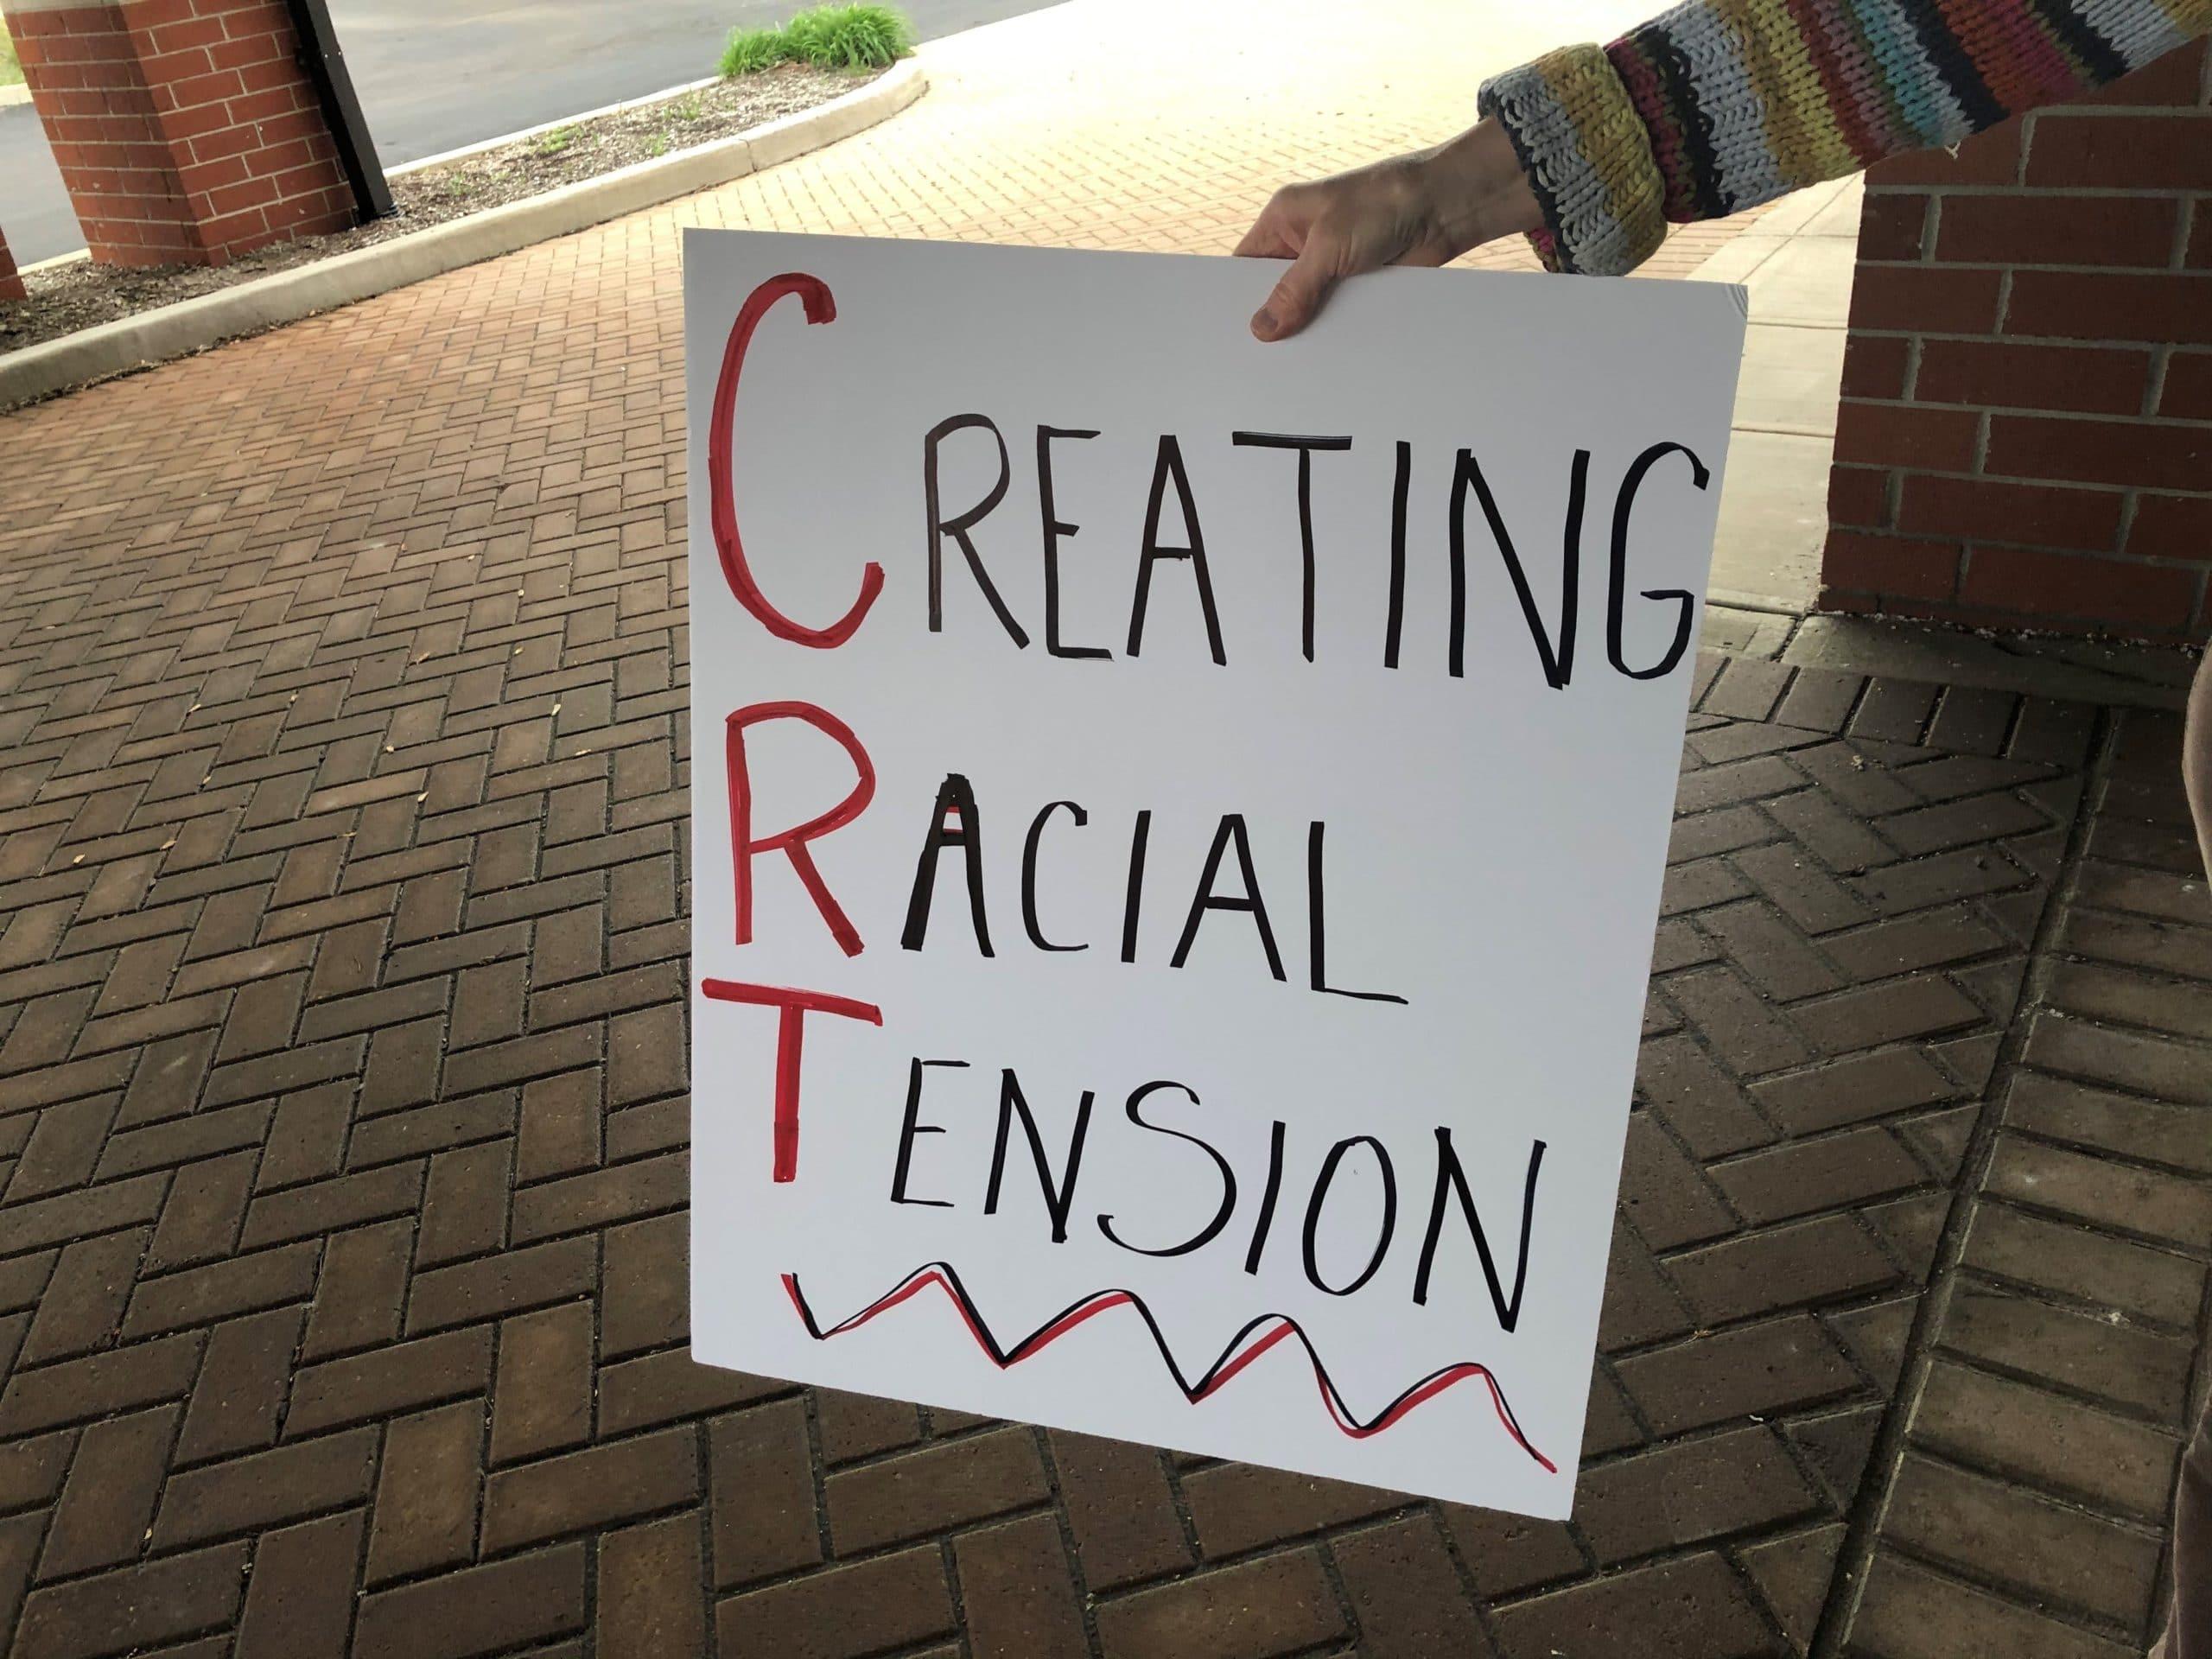 CRT - Creating Racial Tension